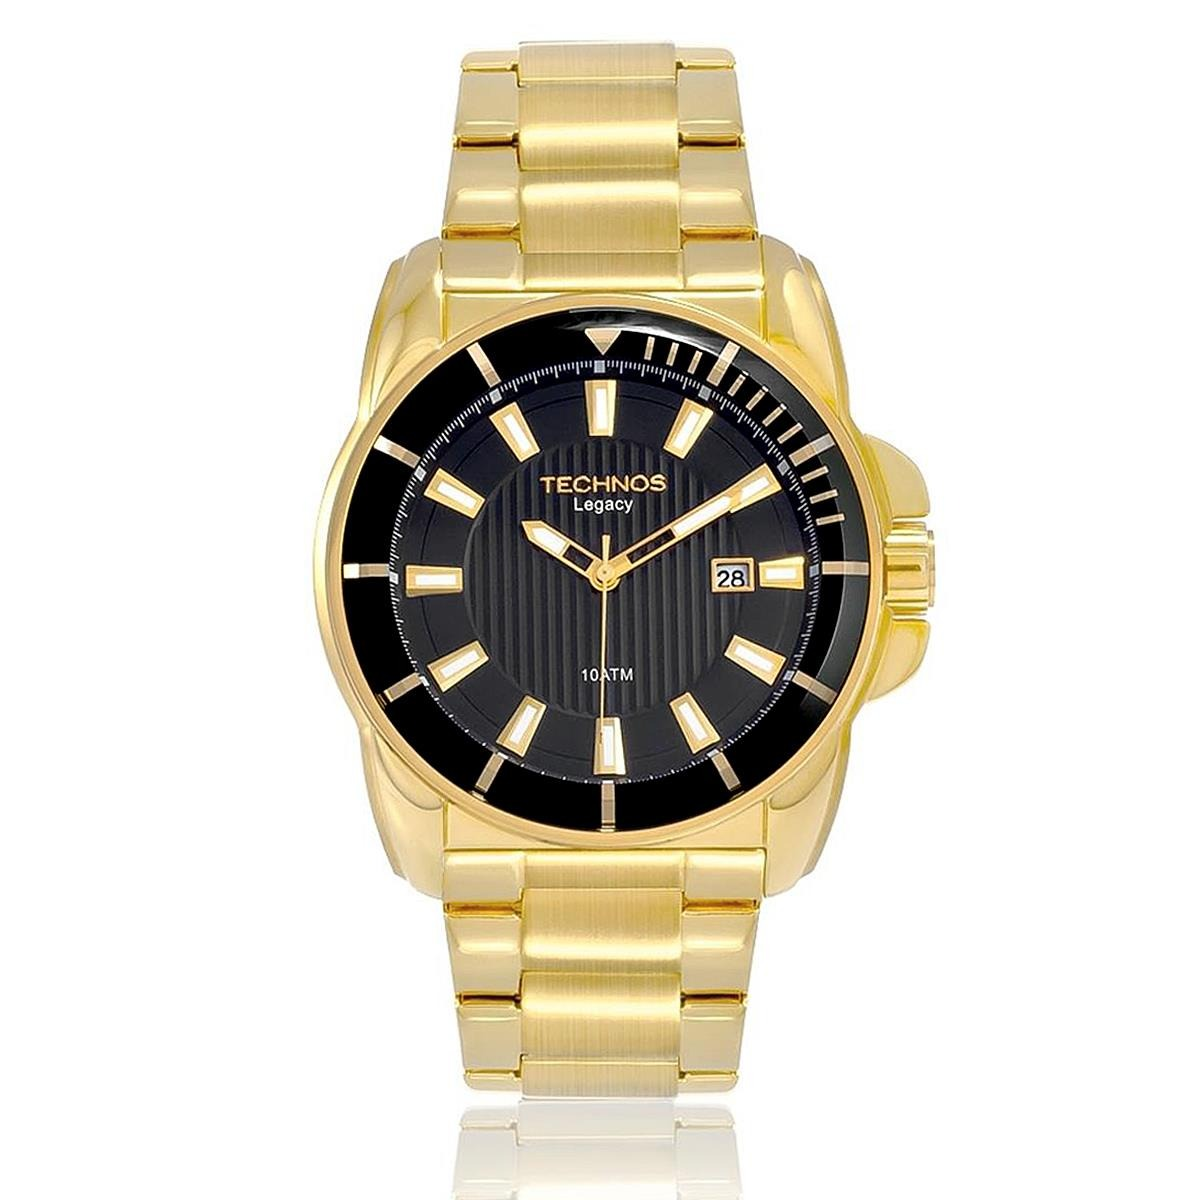 c87737e3c06 relógio masculino technos classic legacy analógico 2315aap 4. Carregando  zoom.